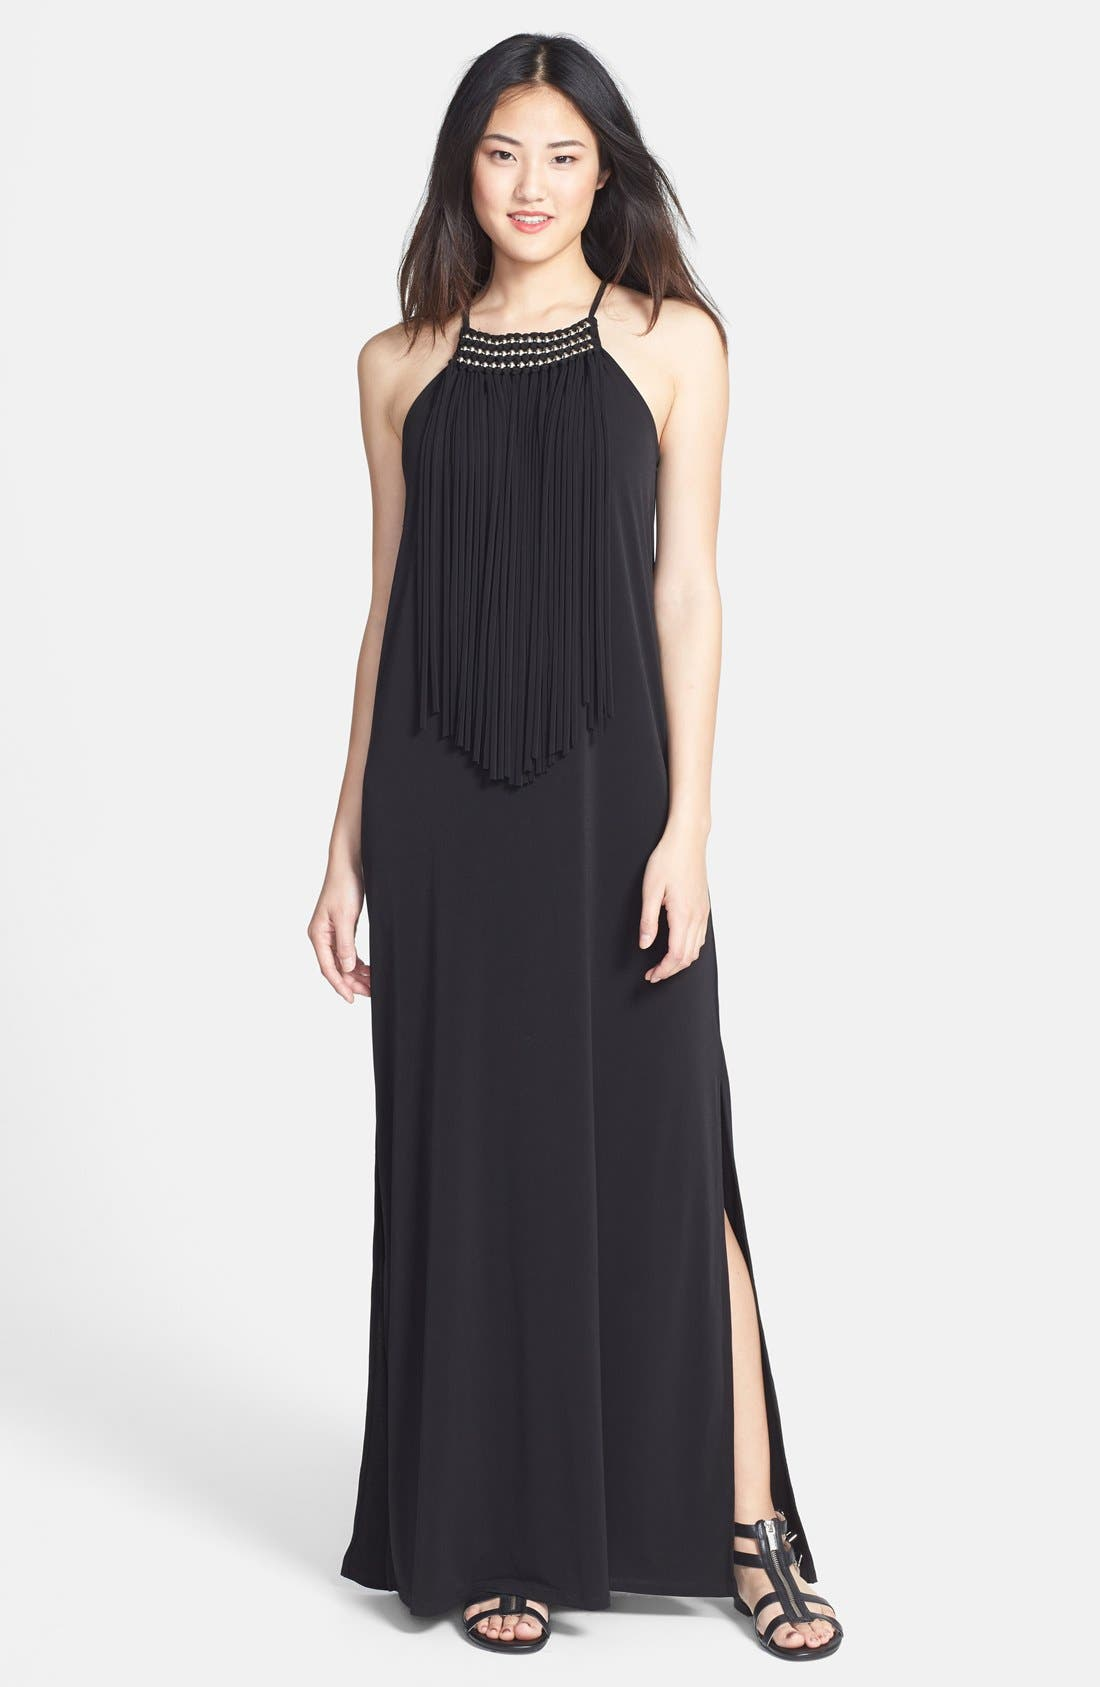 Bright Fringe Maxi Dress